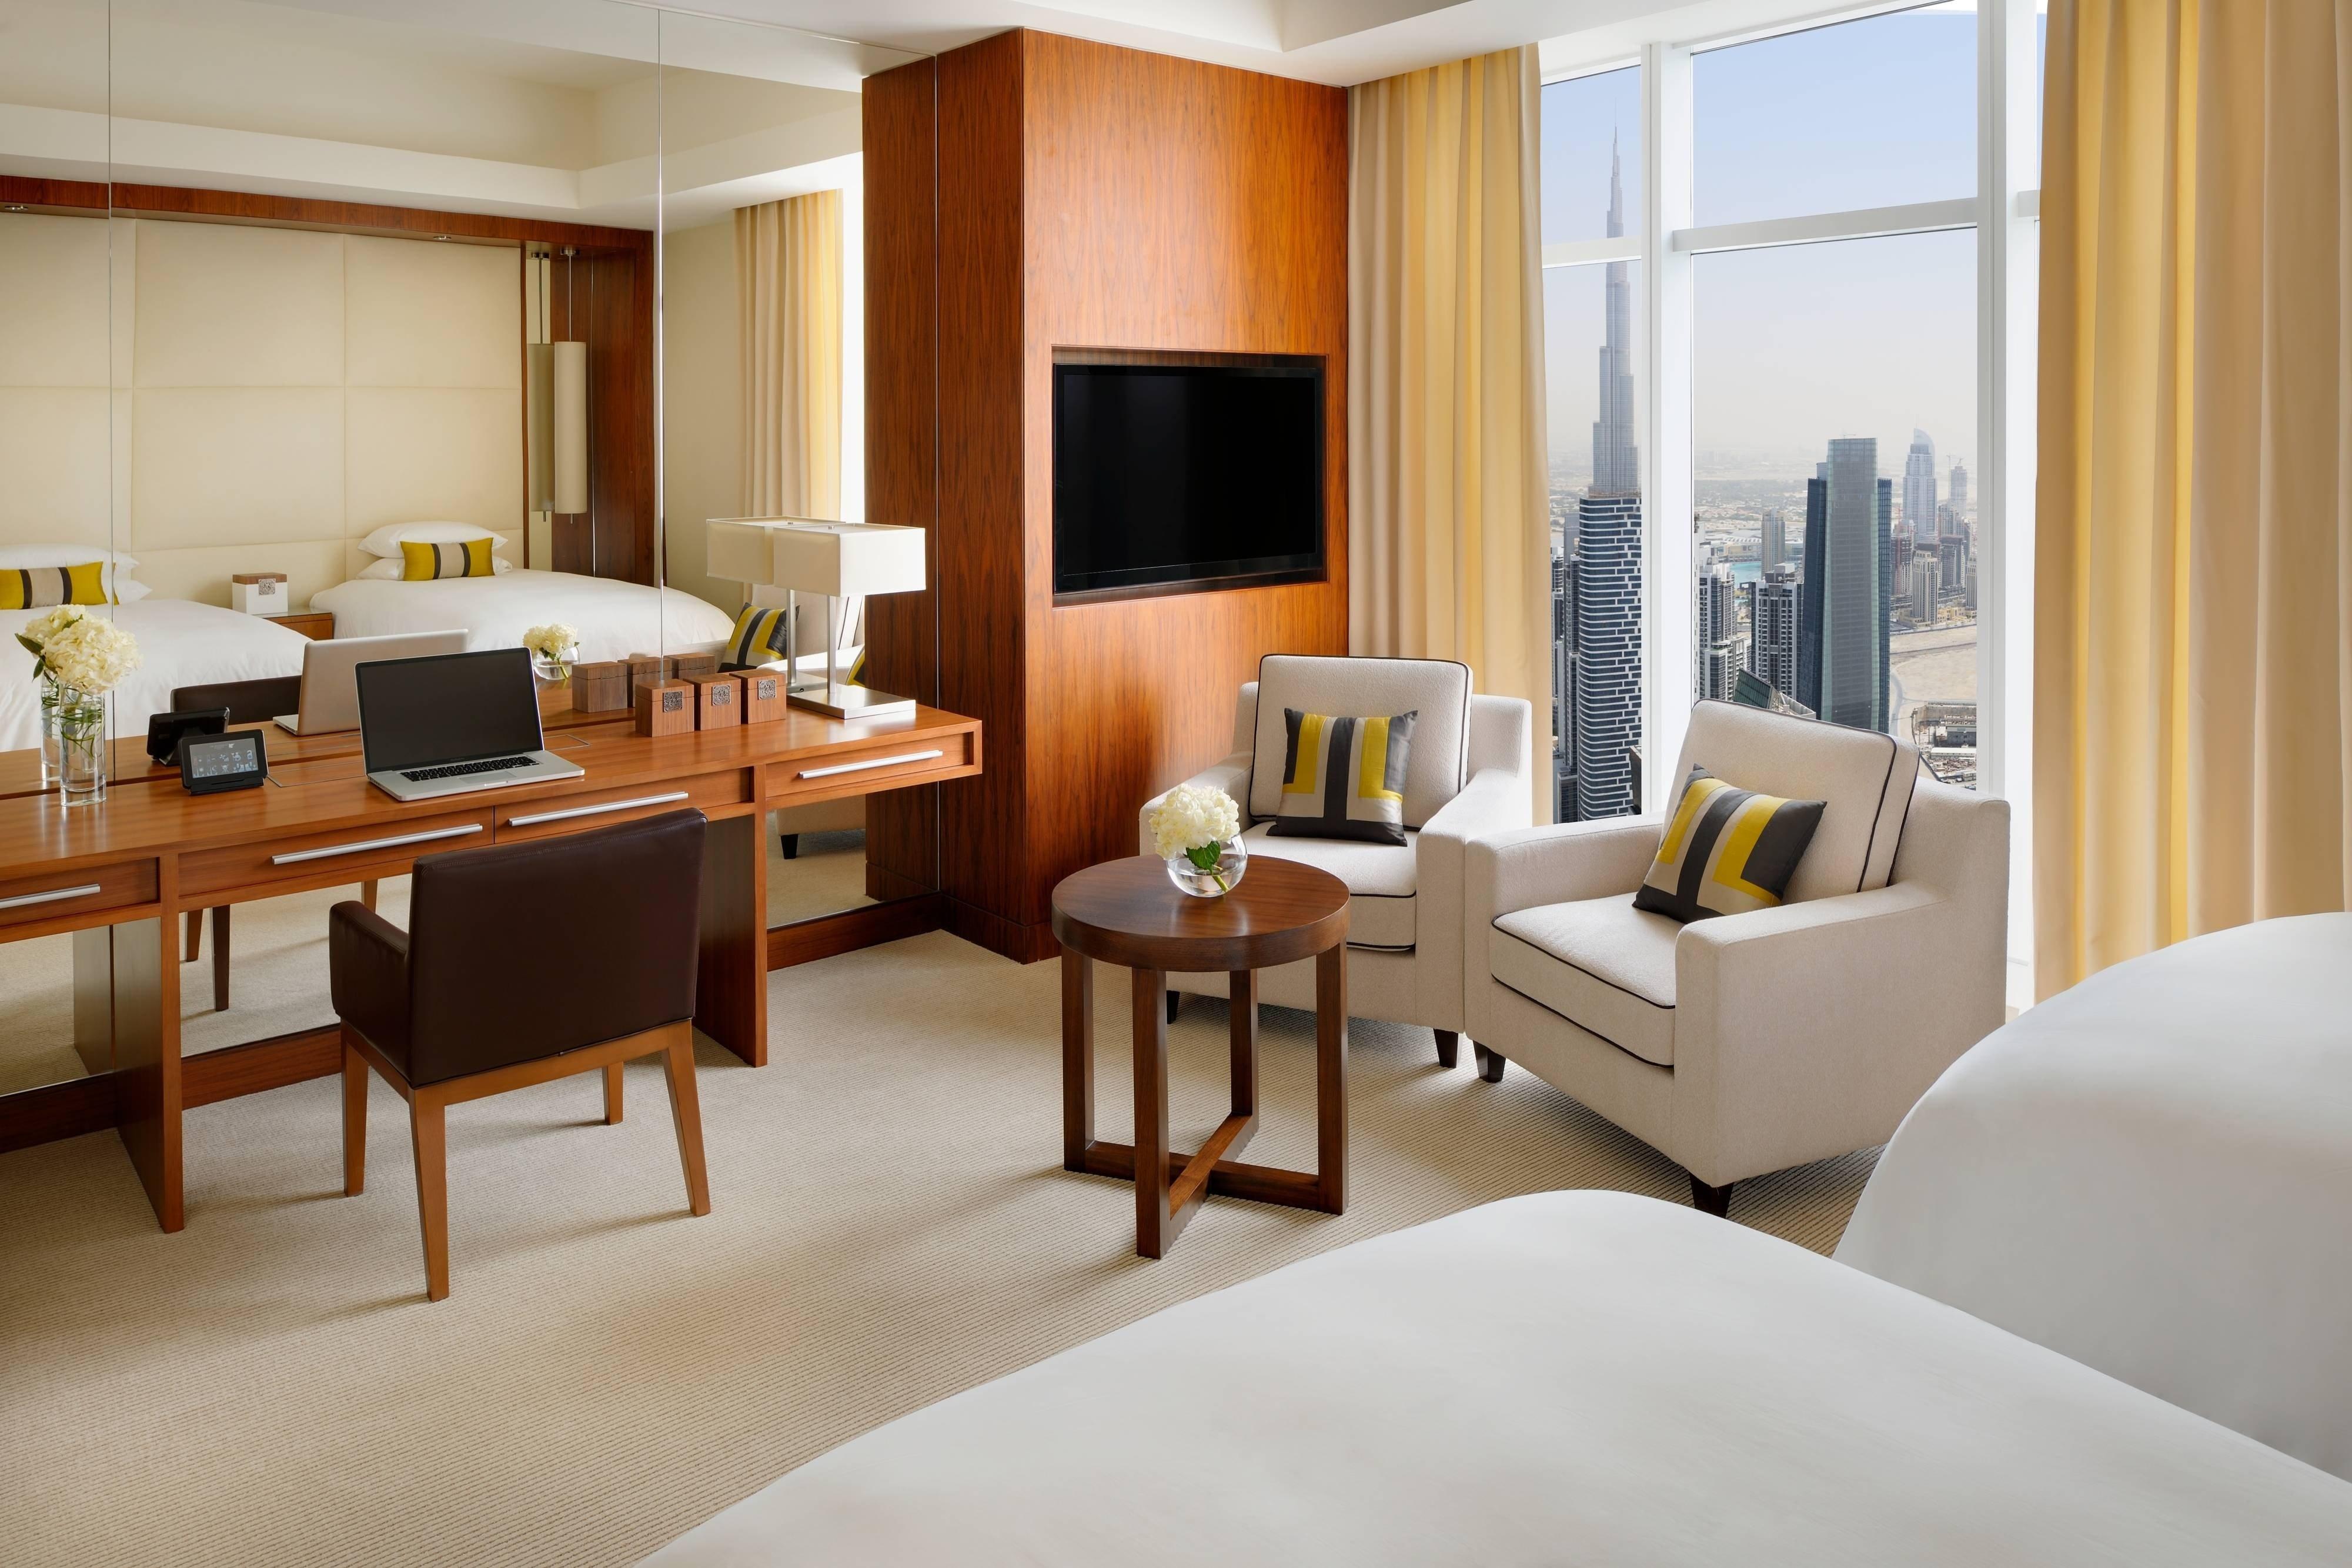 JW Marriott Marquis Hotel Dubai, Dubai @INR 7519 OFF ( ̶7̶5̶1̶9̶ ...